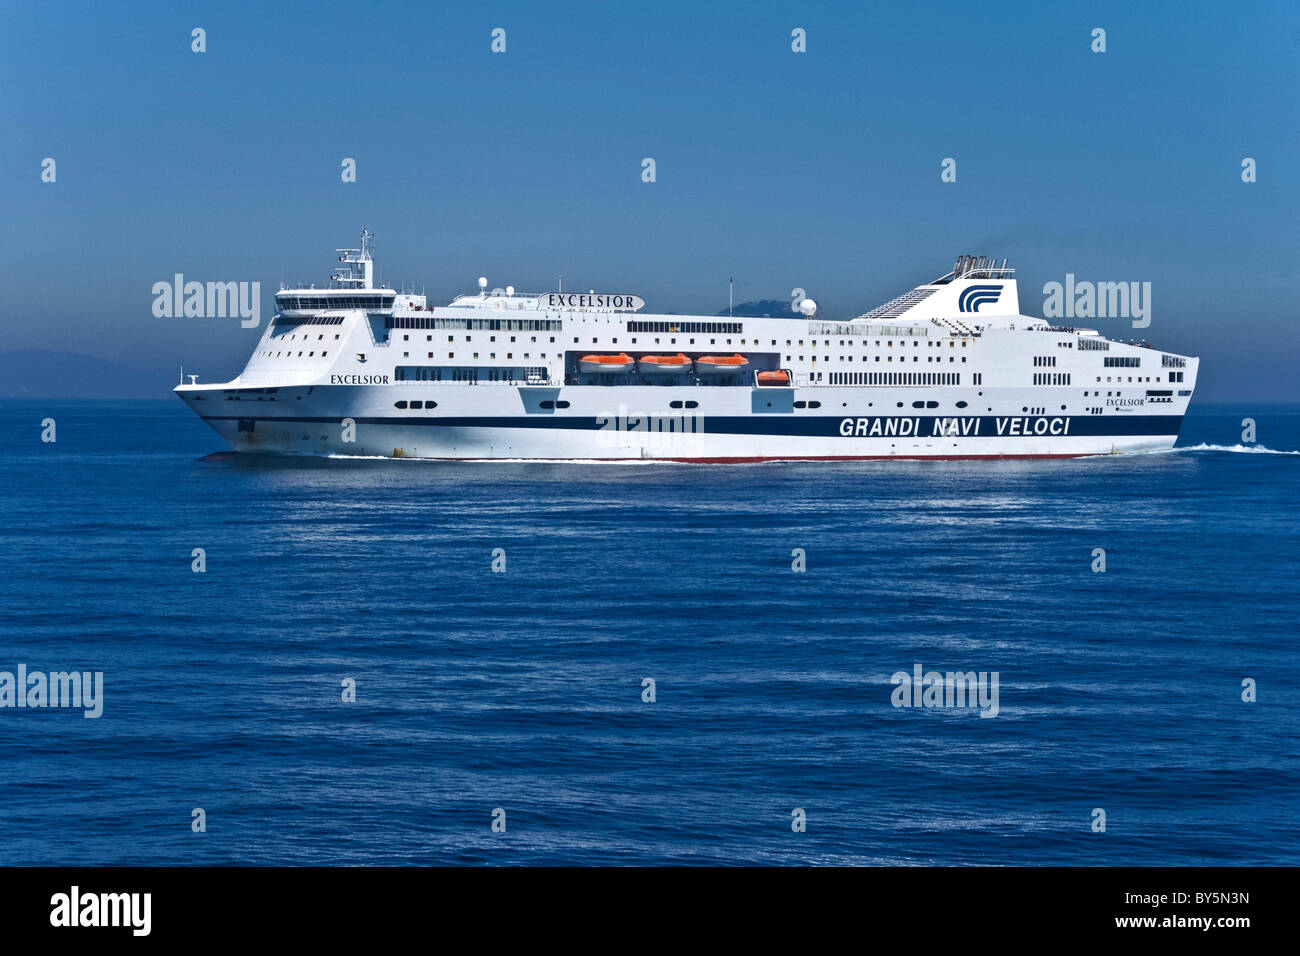 Grandi Navi Veloci ferry Excelsior at sea en route to Barcelona from Genoa Stock Photo